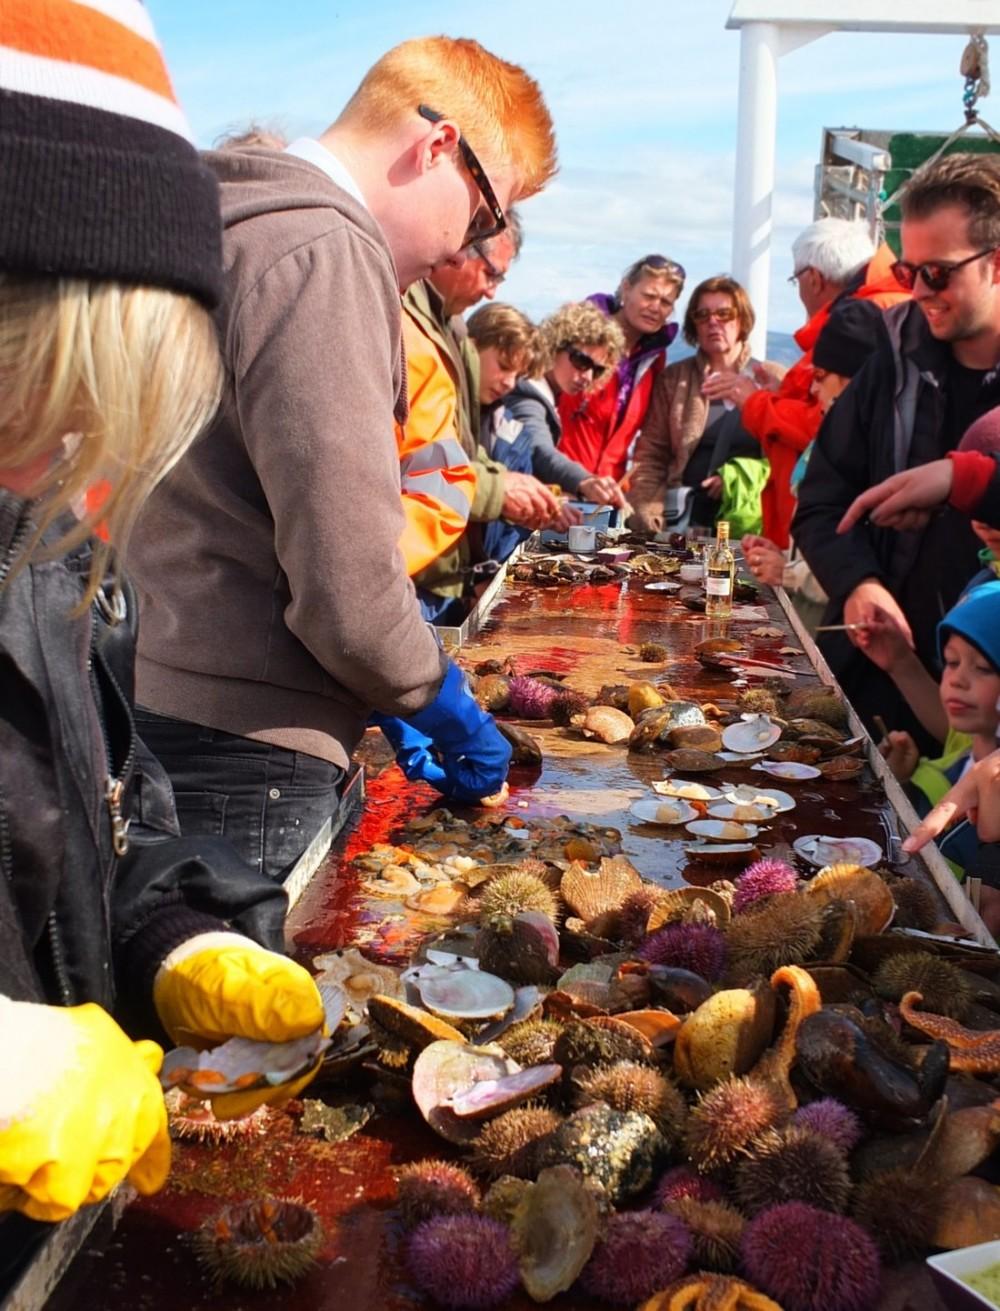 Iceland-Islande-Stykkisholmur-sushi-tour-noix-saint-jacques-e1444904760766.jpg